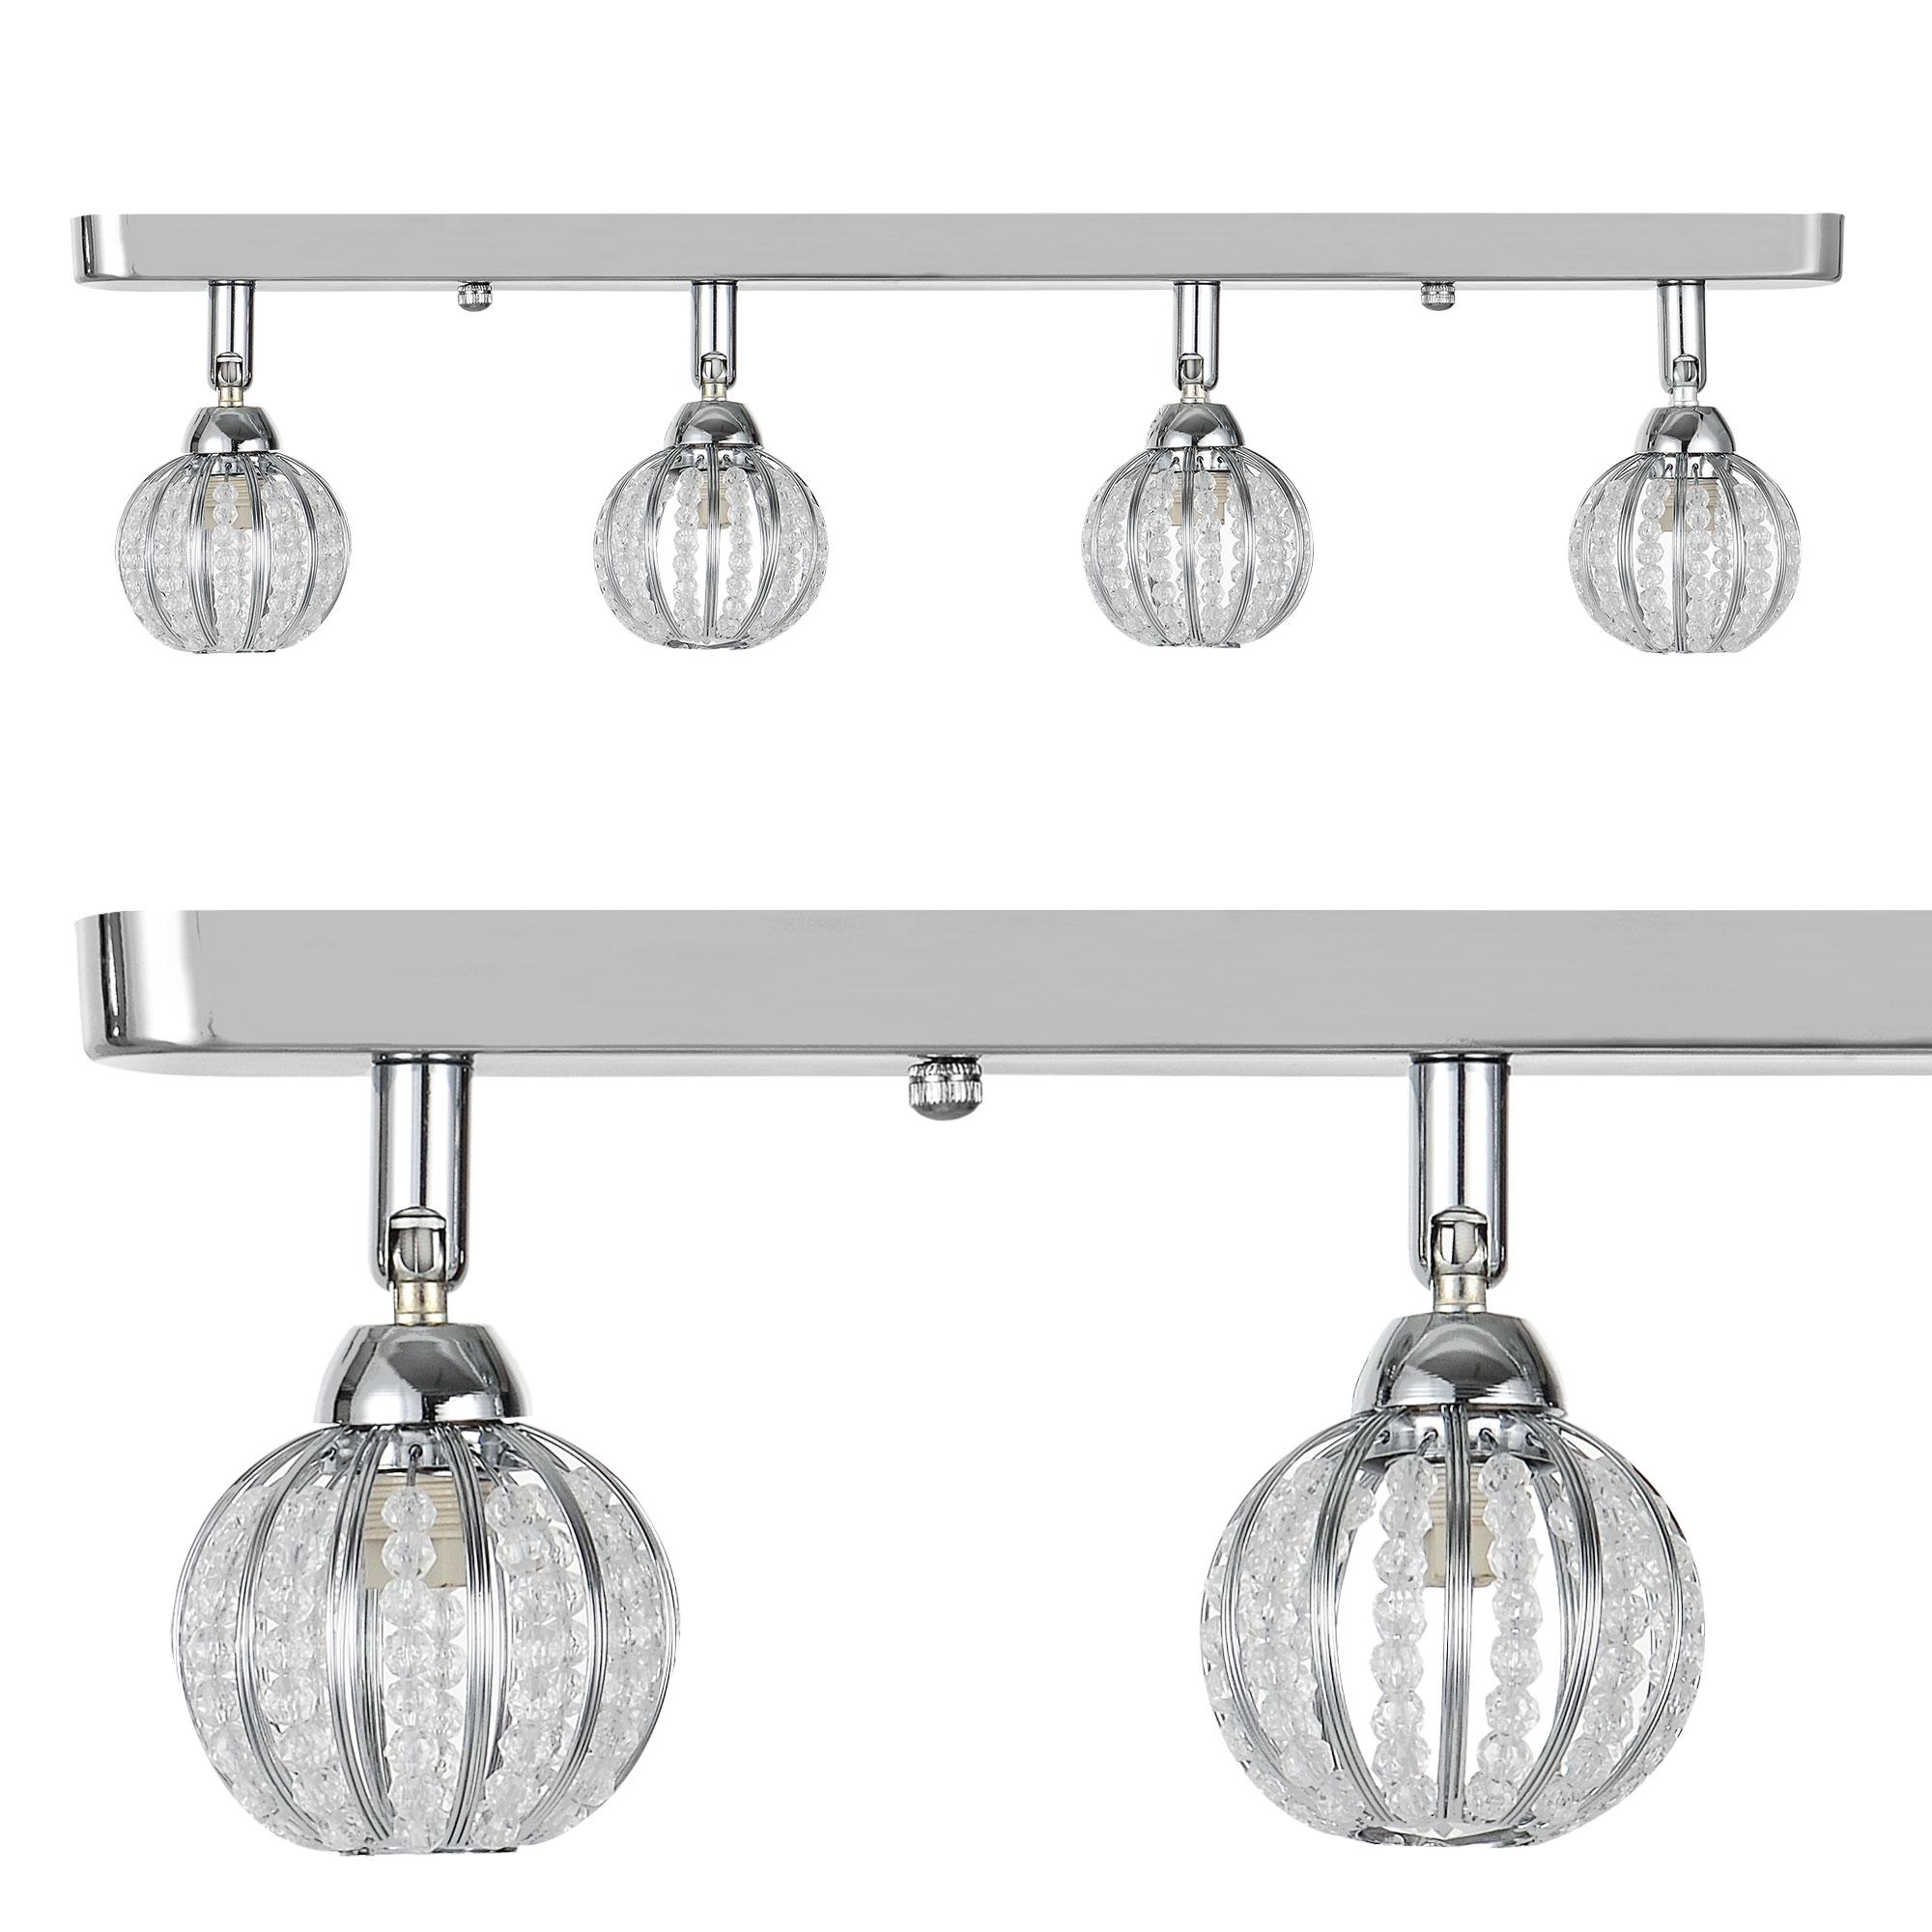 design decken leuchte deckenlampe beleuchtung modern l ster chrome ebay. Black Bedroom Furniture Sets. Home Design Ideas